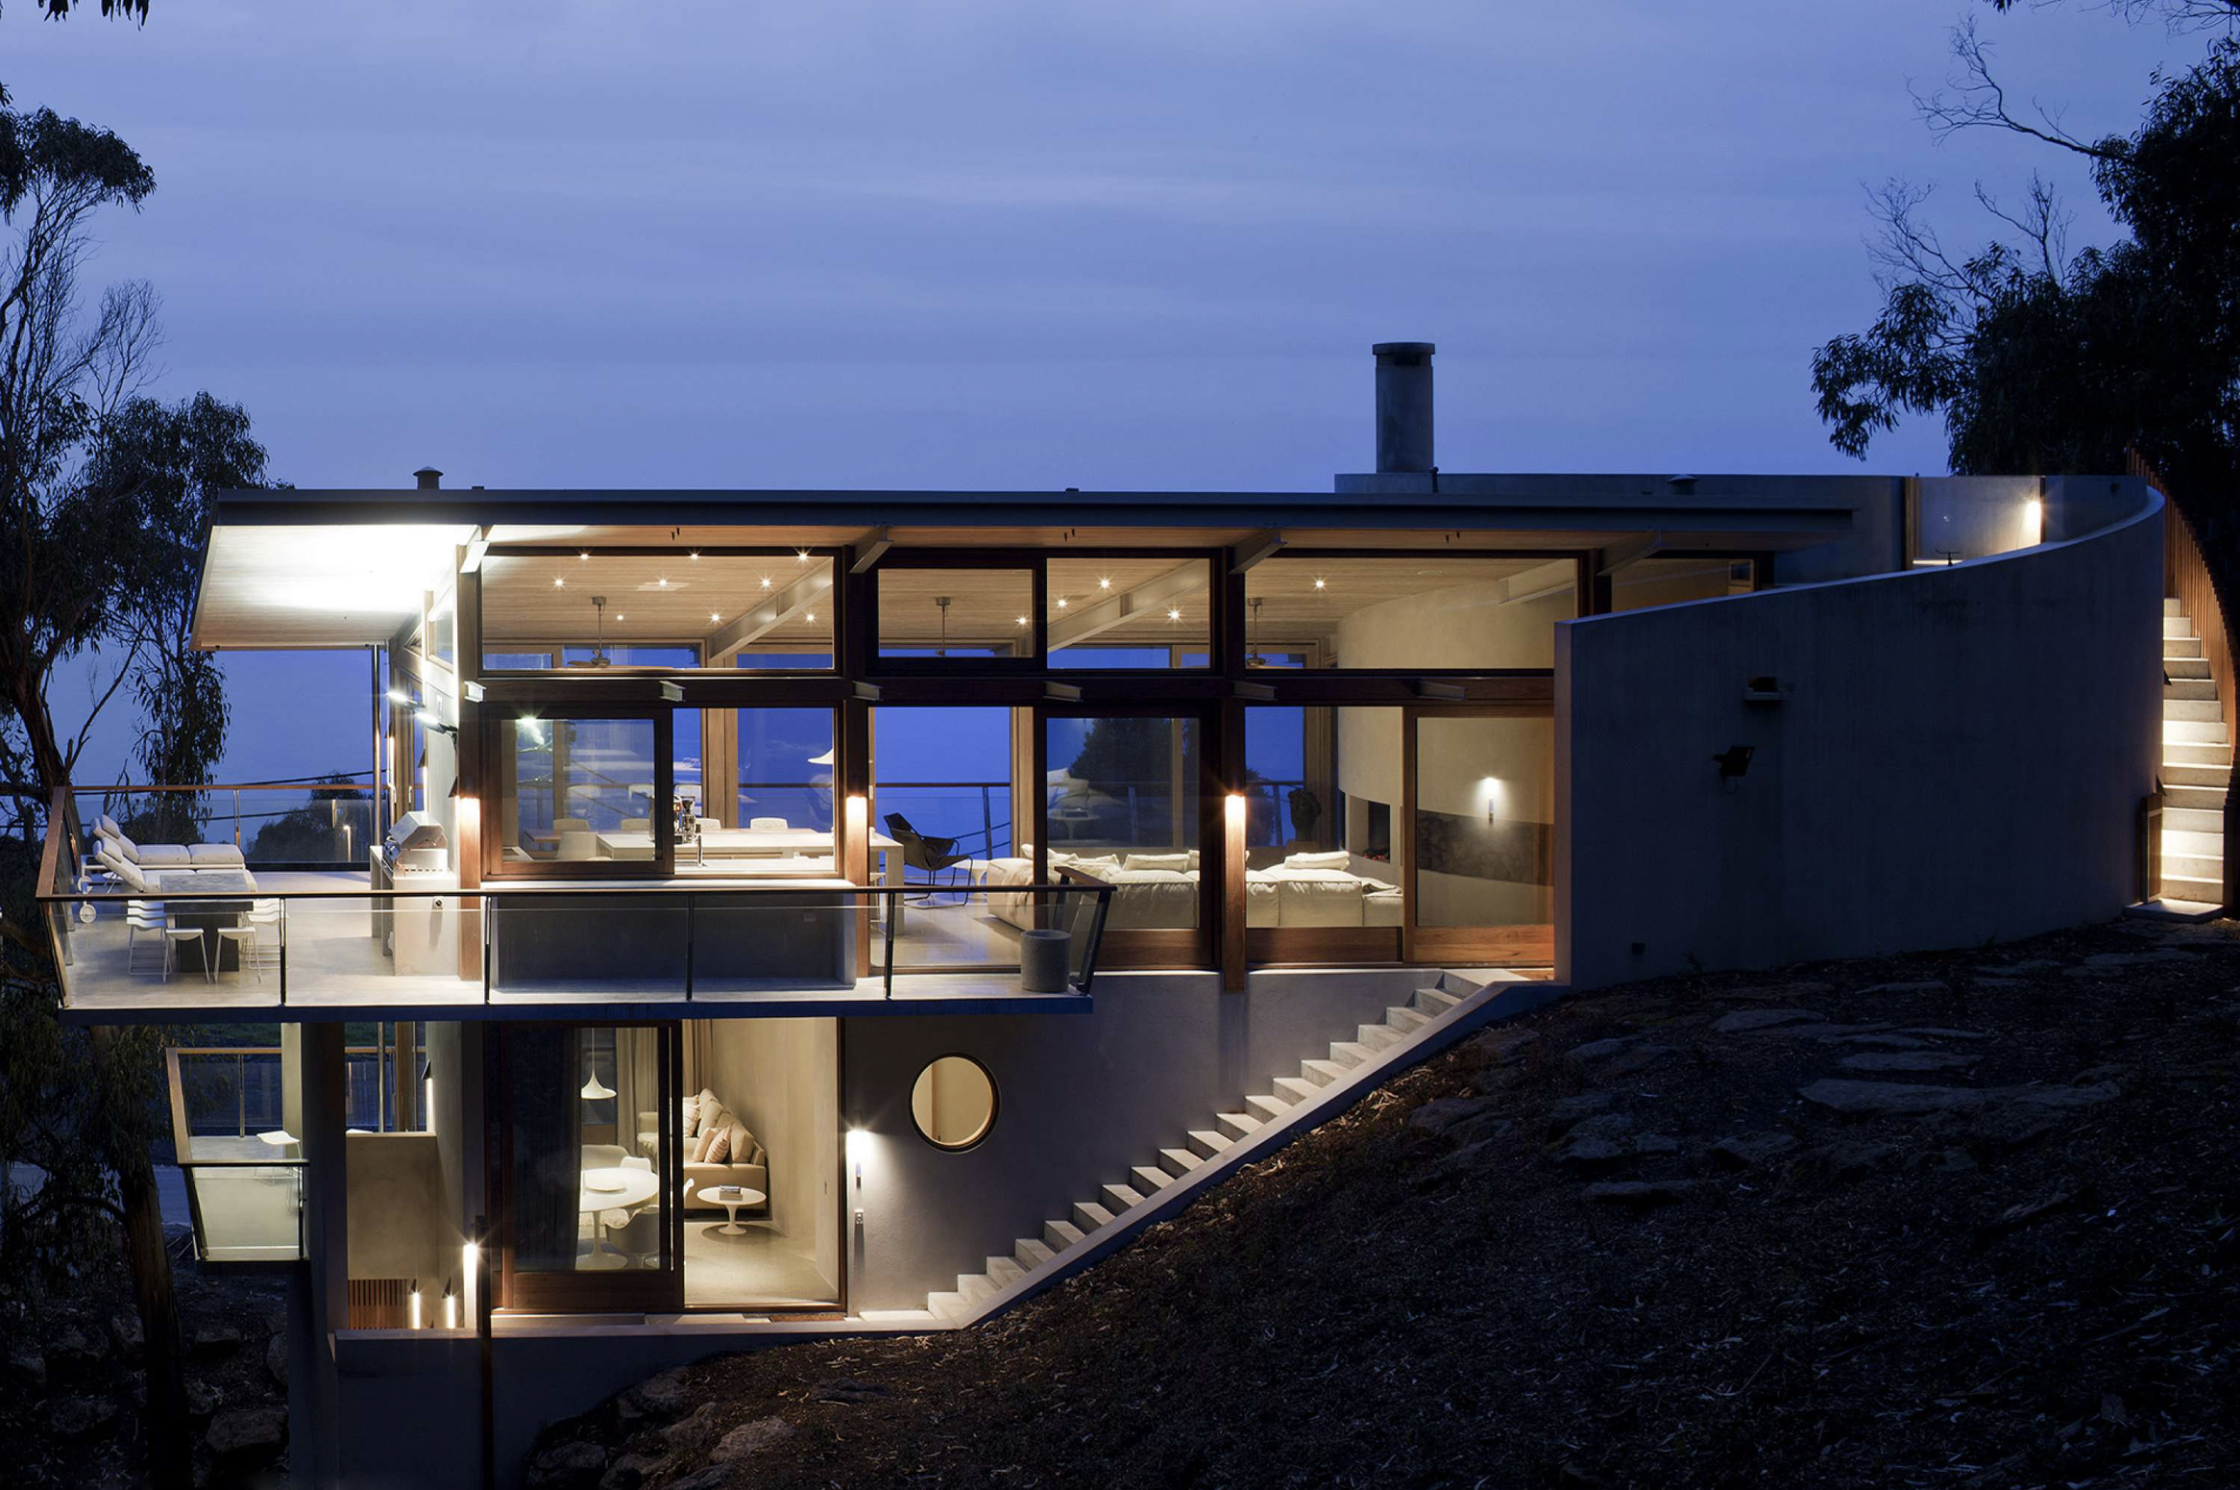 Ocean house by night